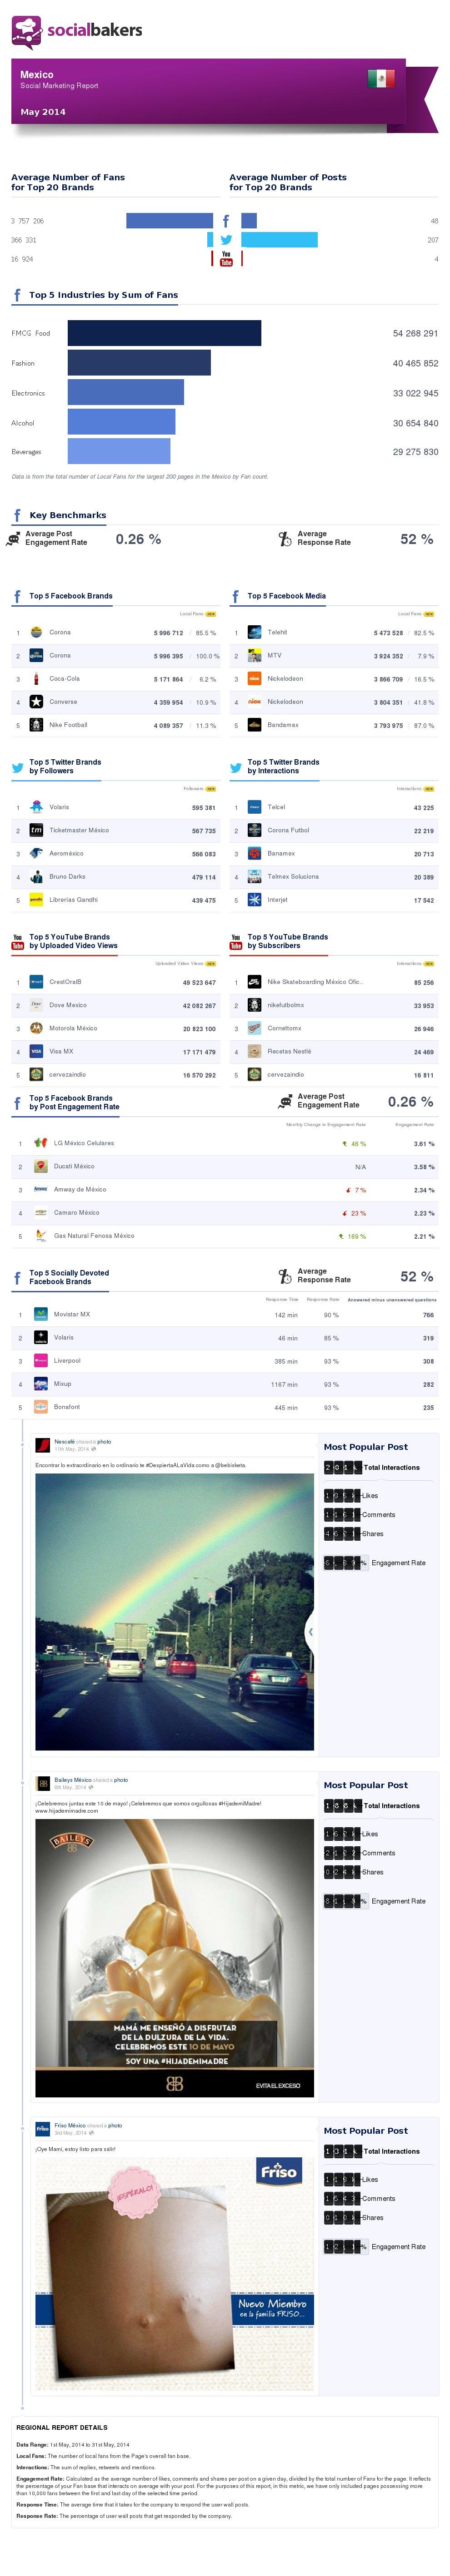 may-2014-social-marketing-report-mexico-regional-thumbnail